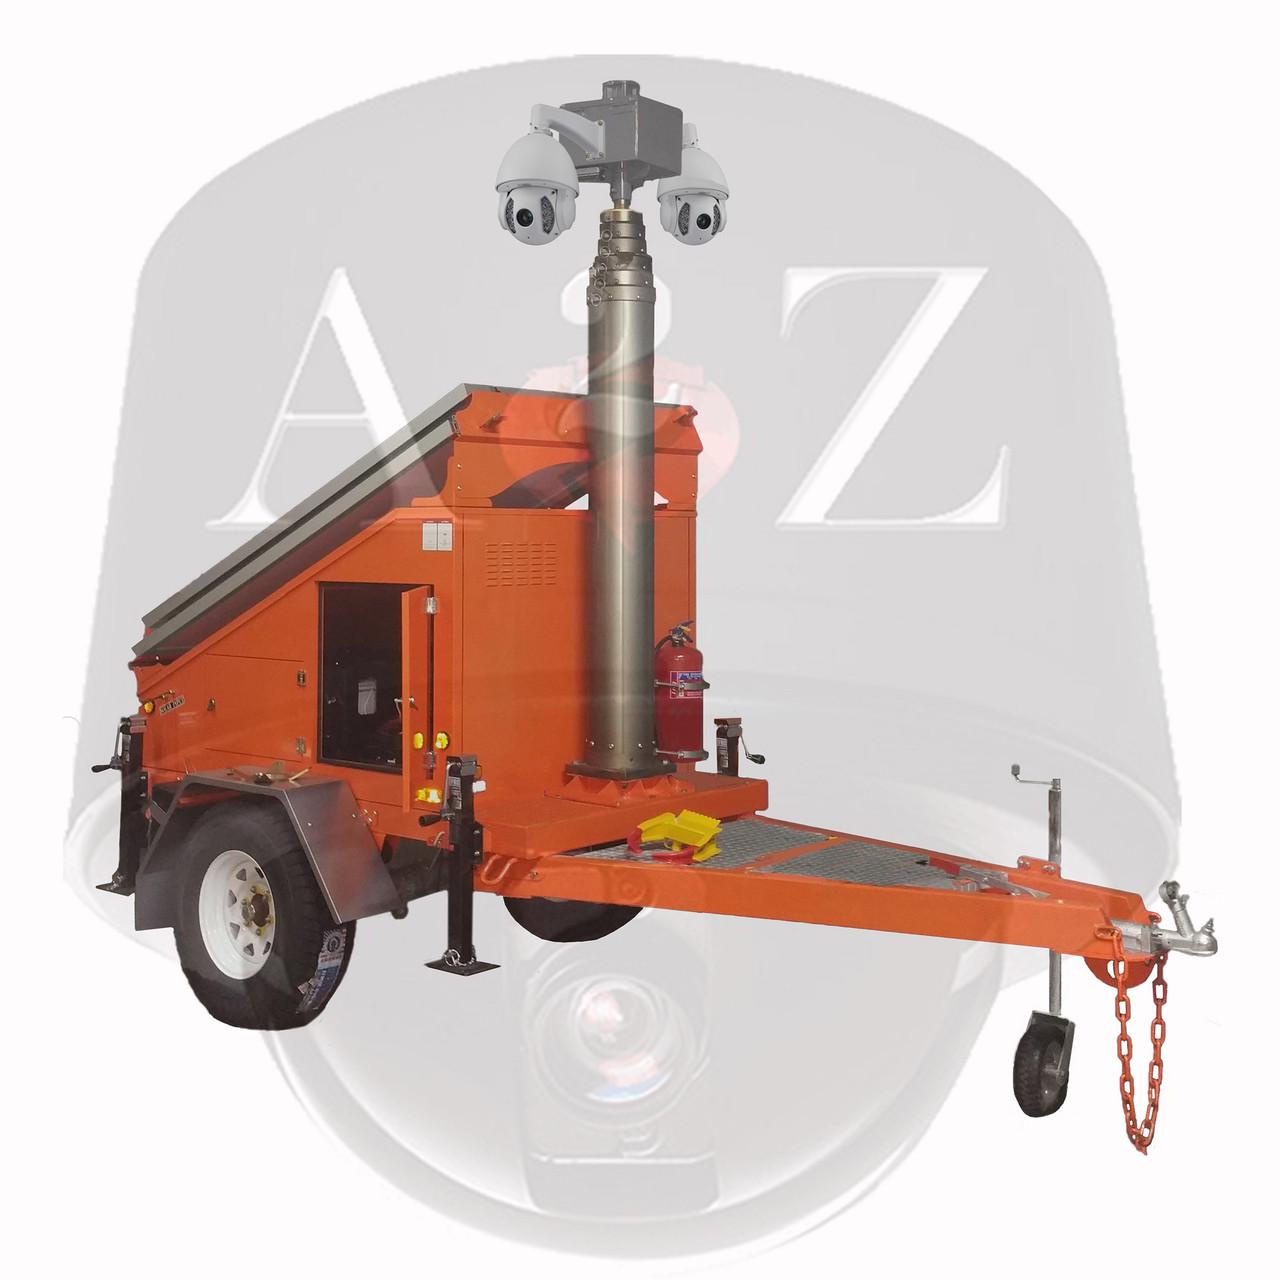 A2z 4g dual hd ir ptz solar security trailer mmst ez3 for Ptz construction